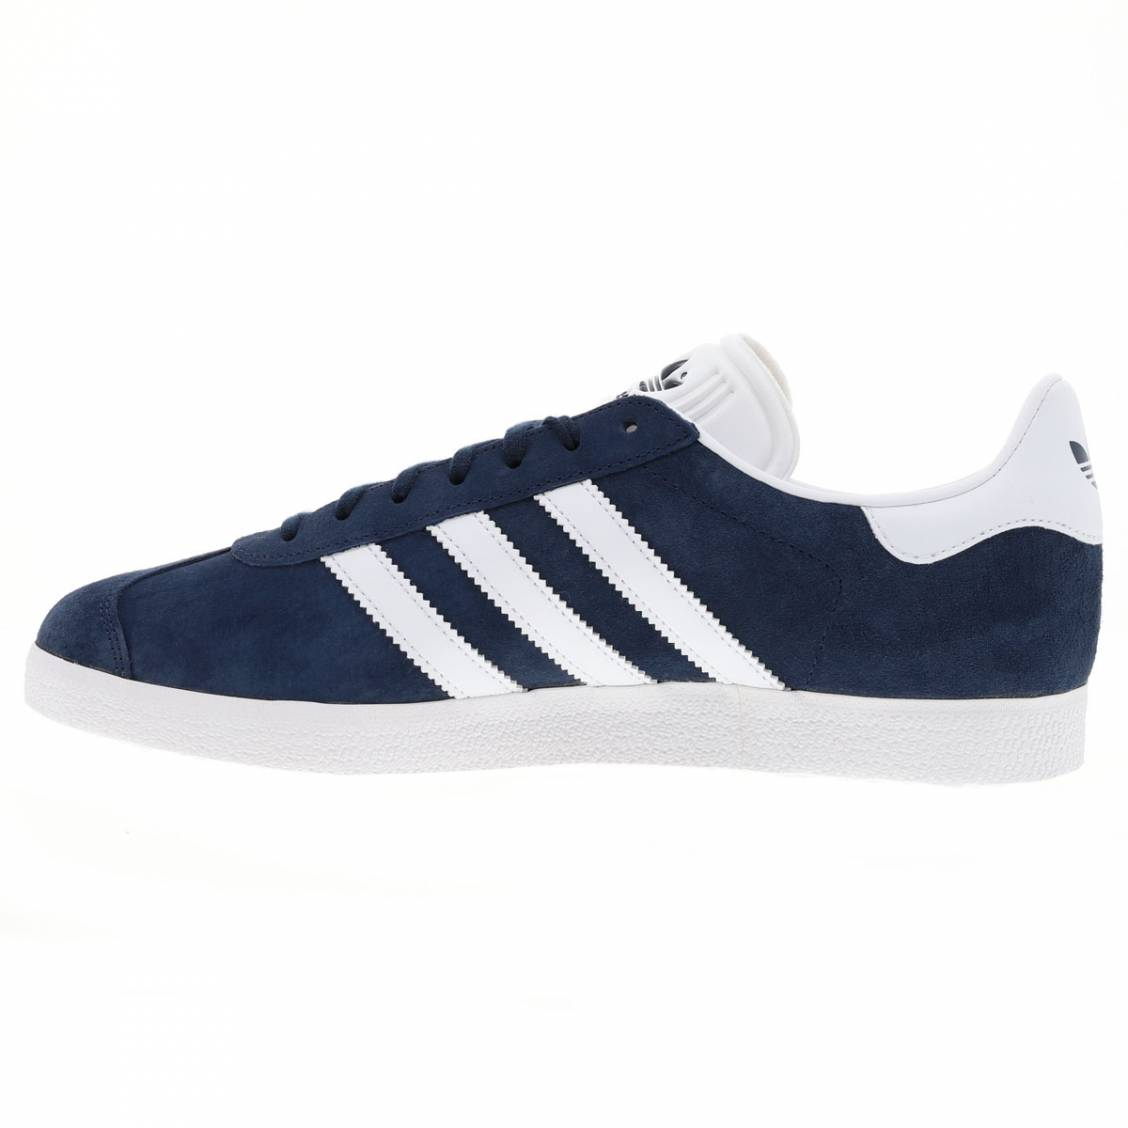 ... Baskets Adidas Gazelle en cuir suédé bleu marine ...